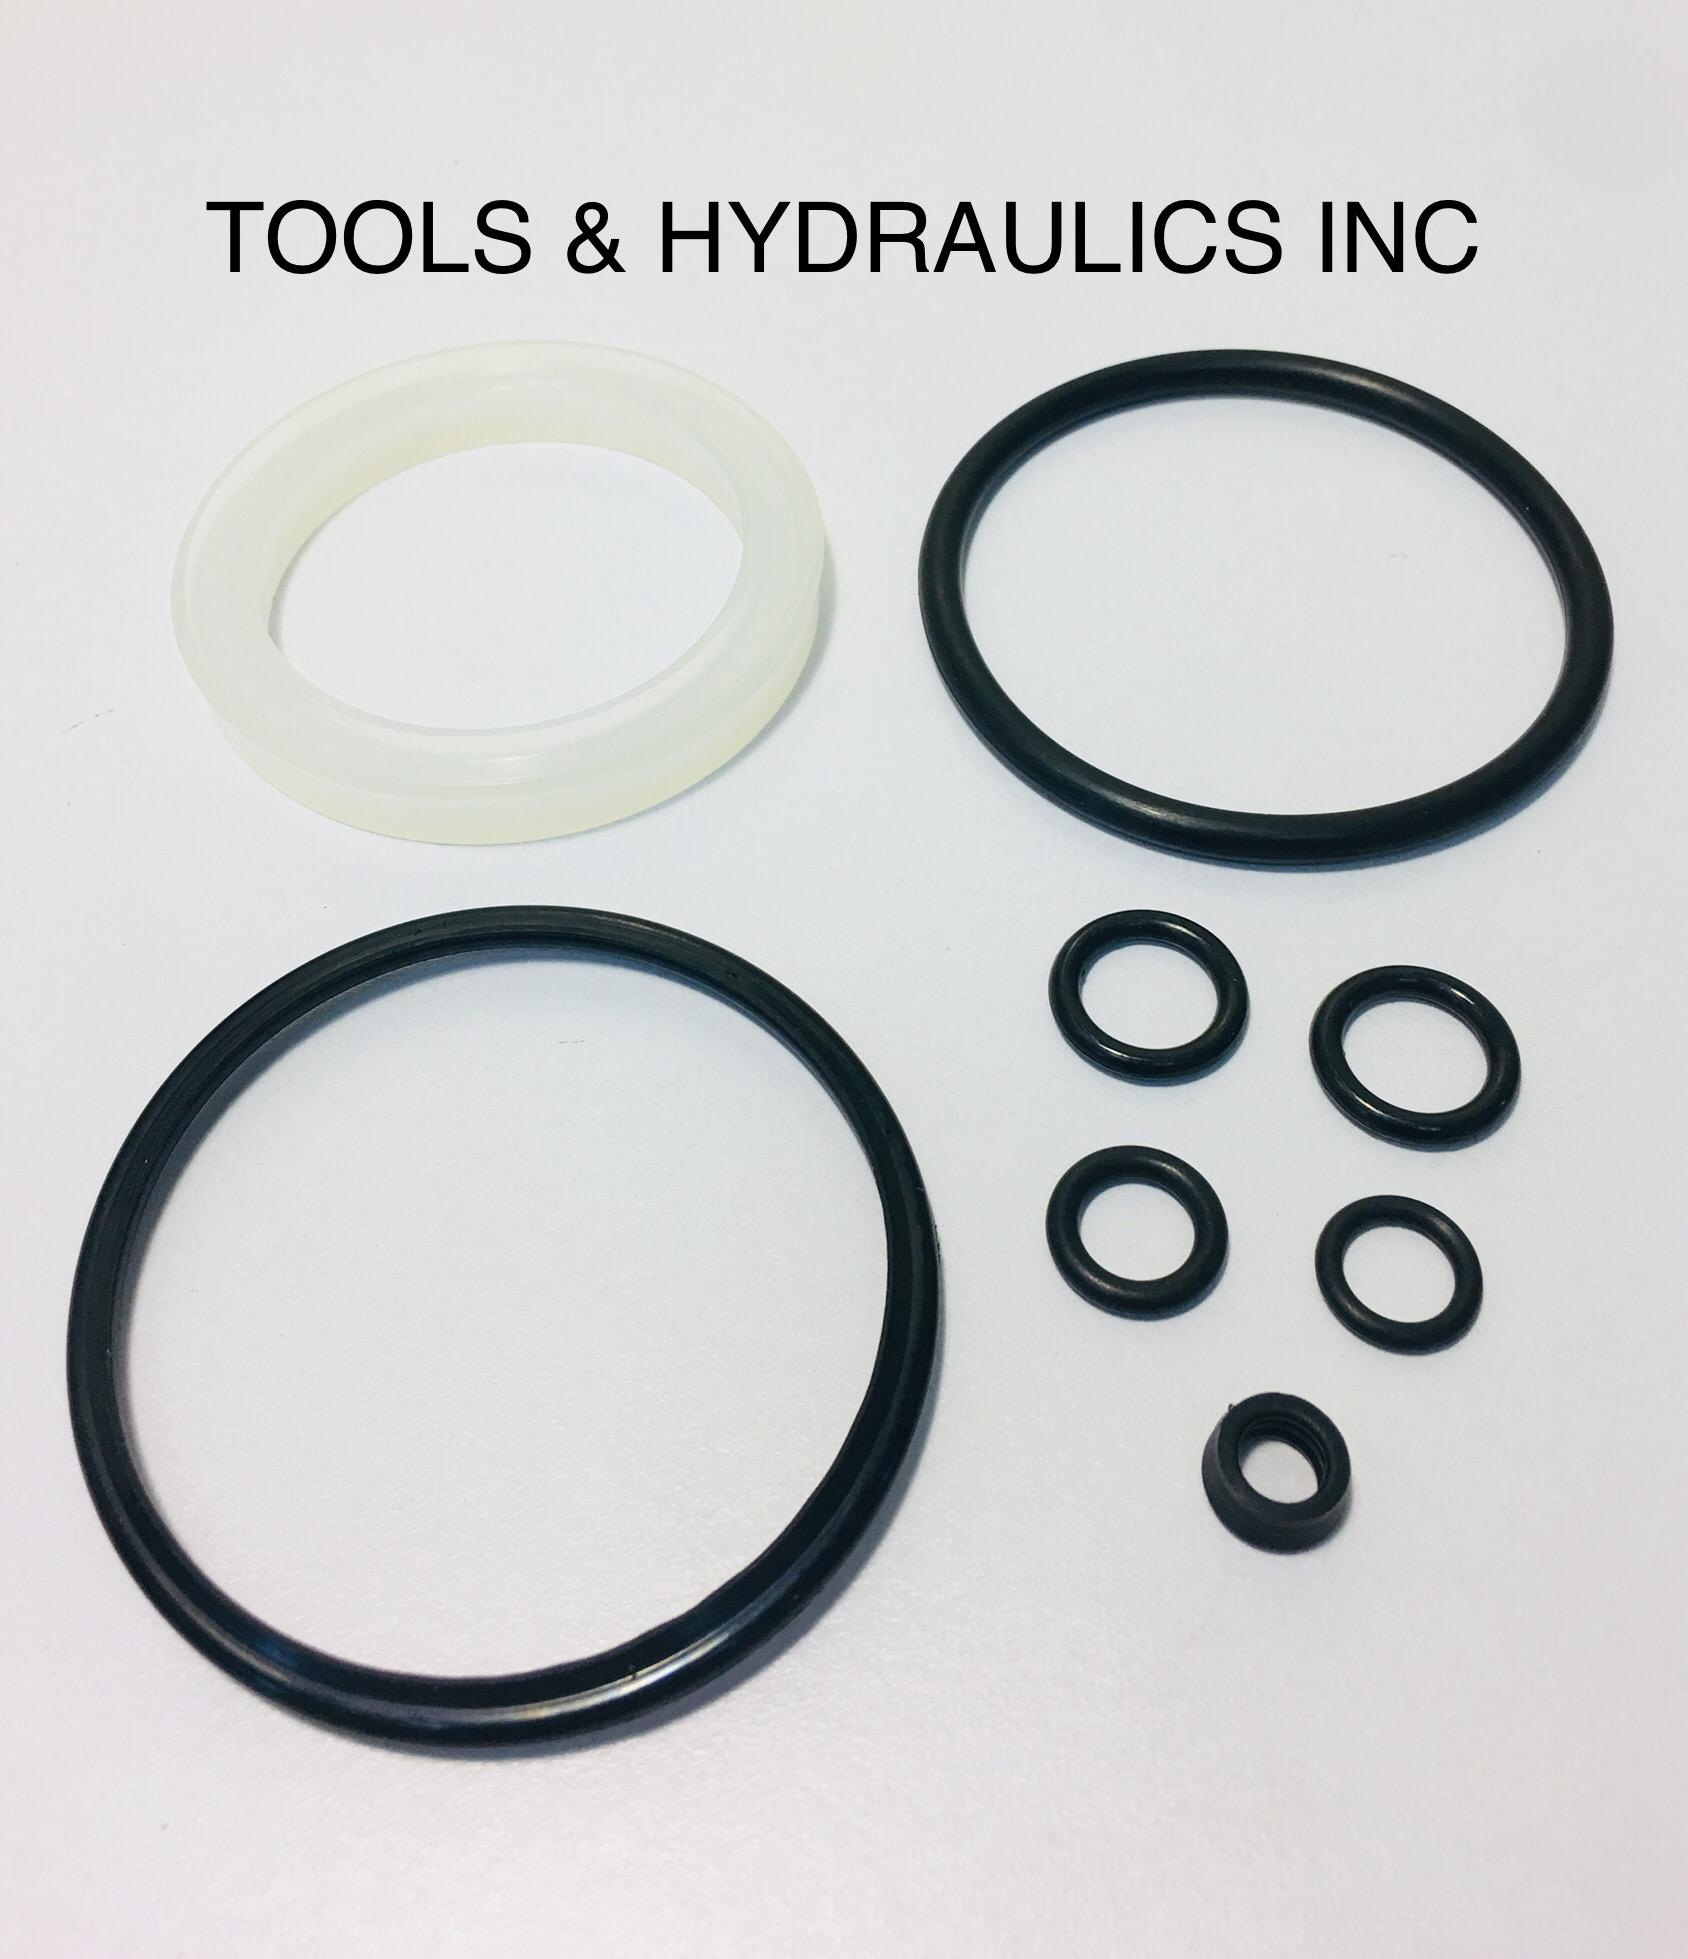 Atd Repair Parts And Kits Bottle Jack Diagram Atd7322 Kit4440